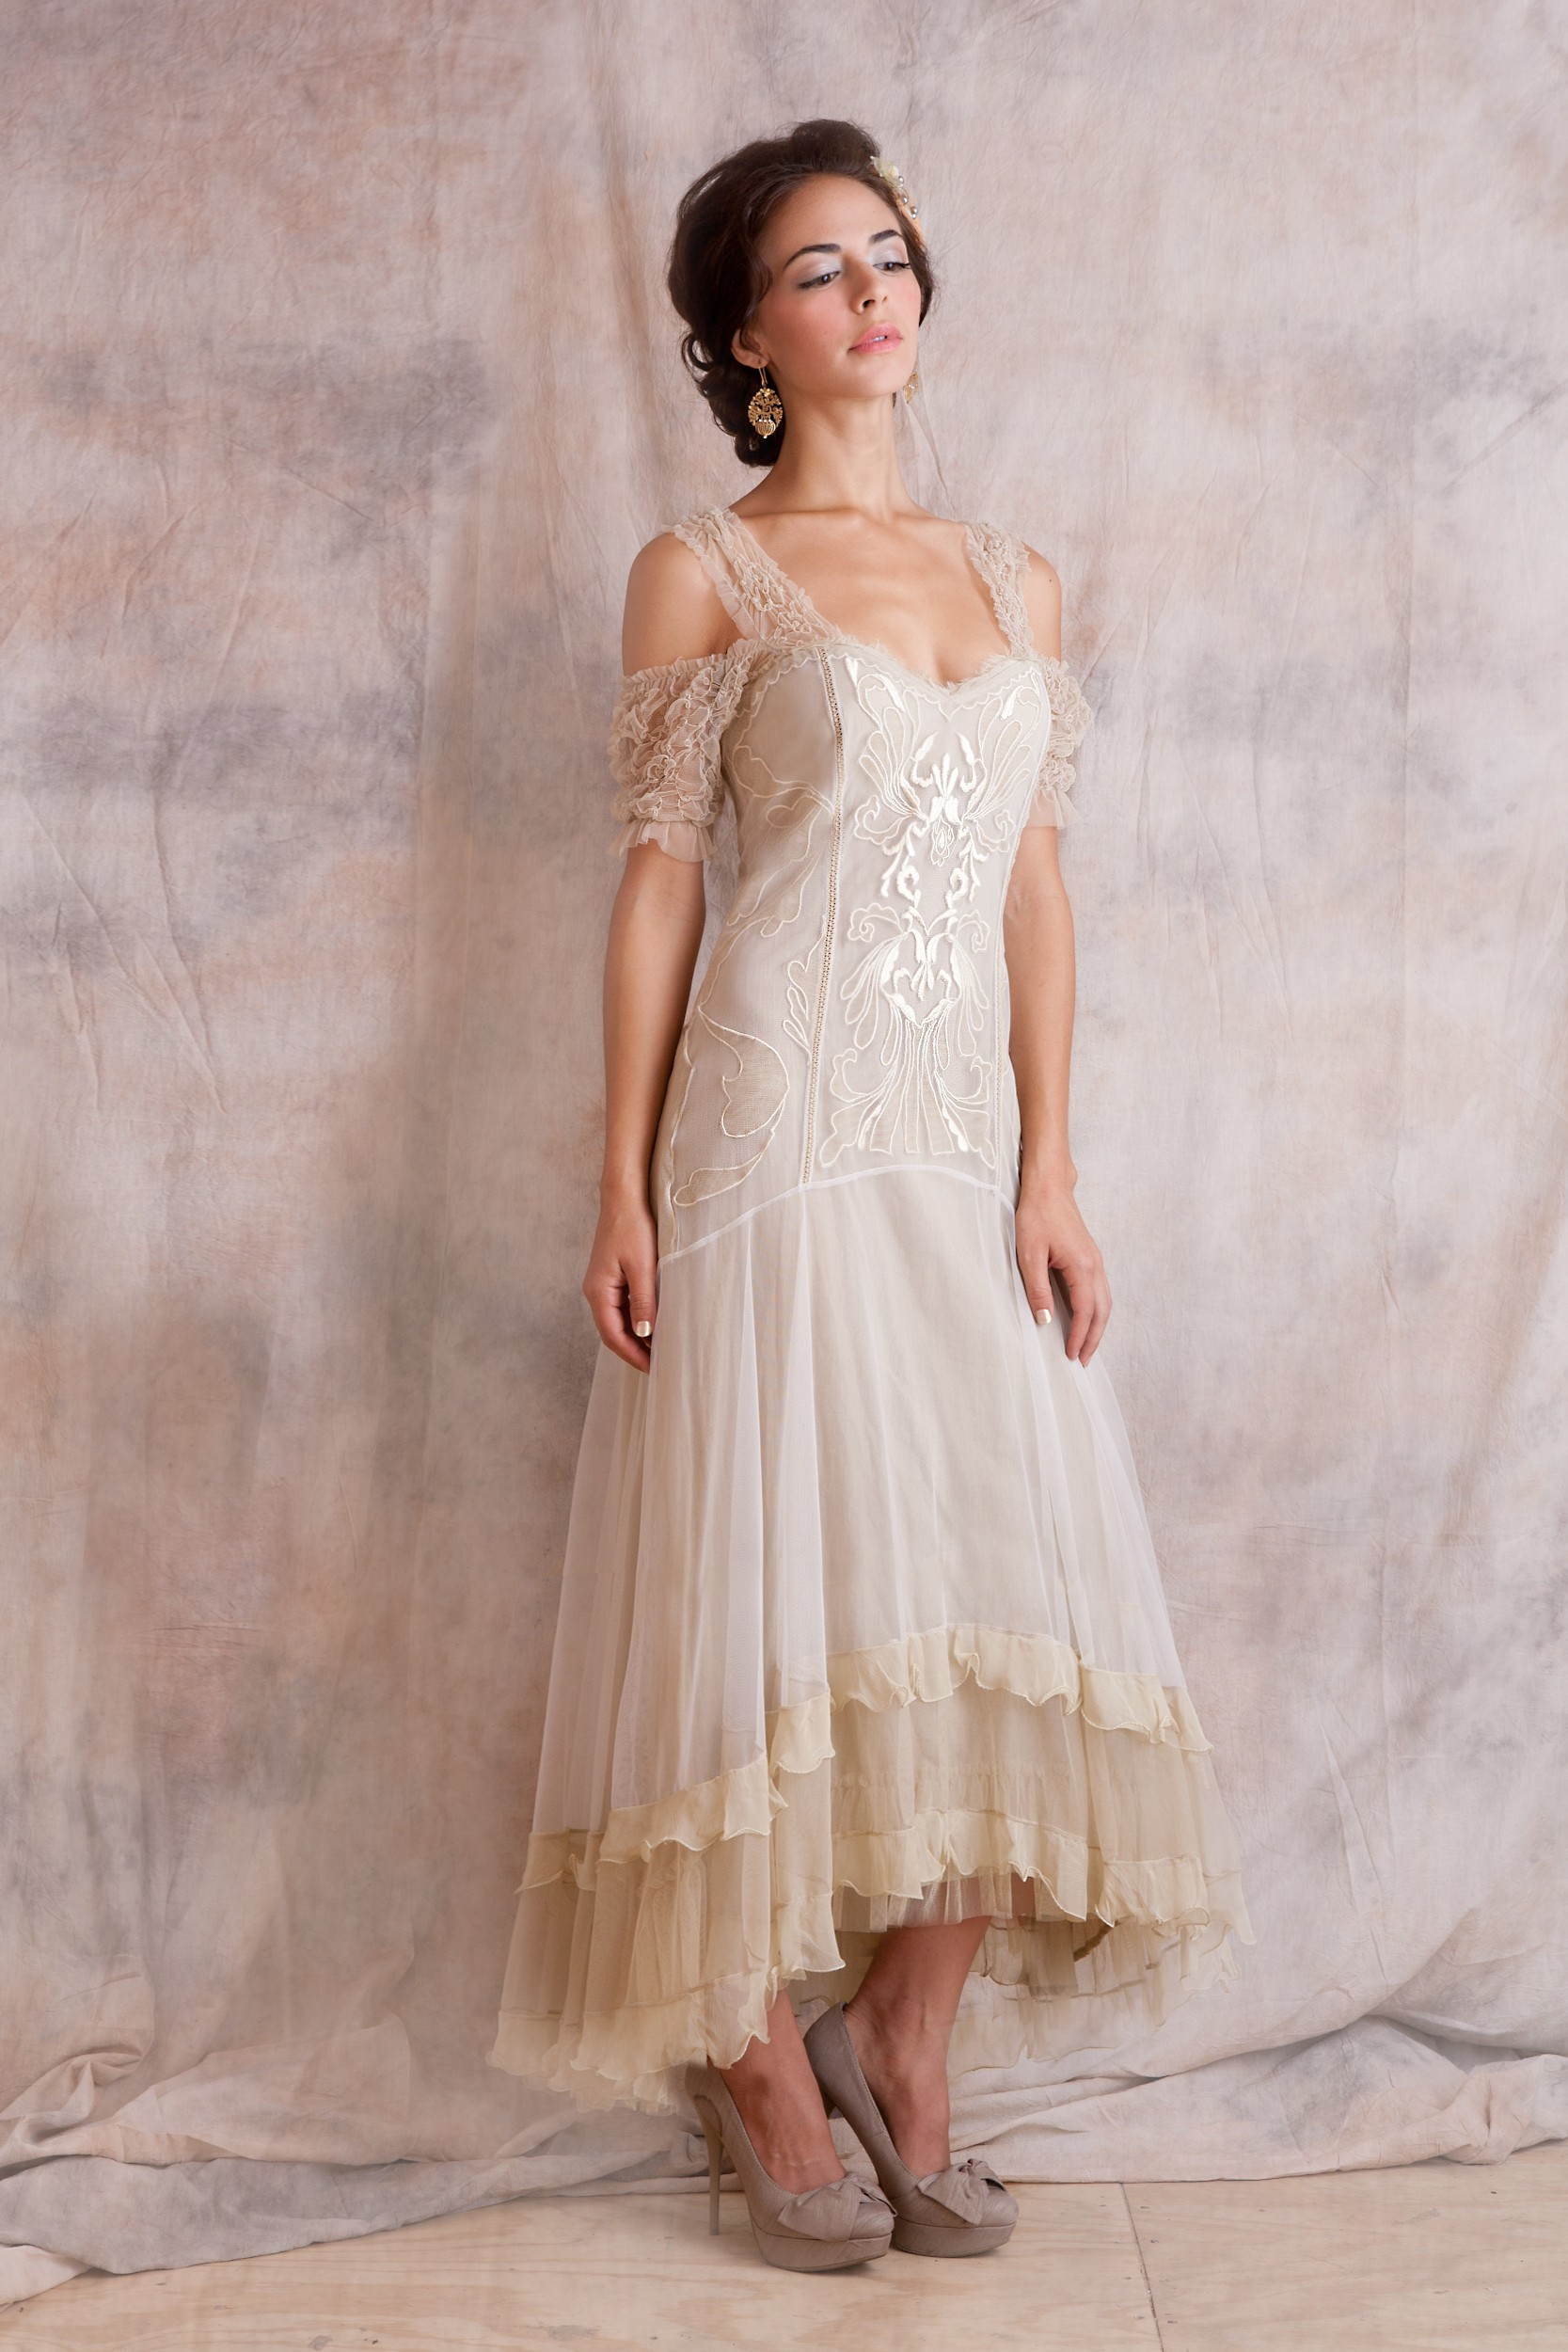 Venetian Wedding Dress In Cream By Nataya